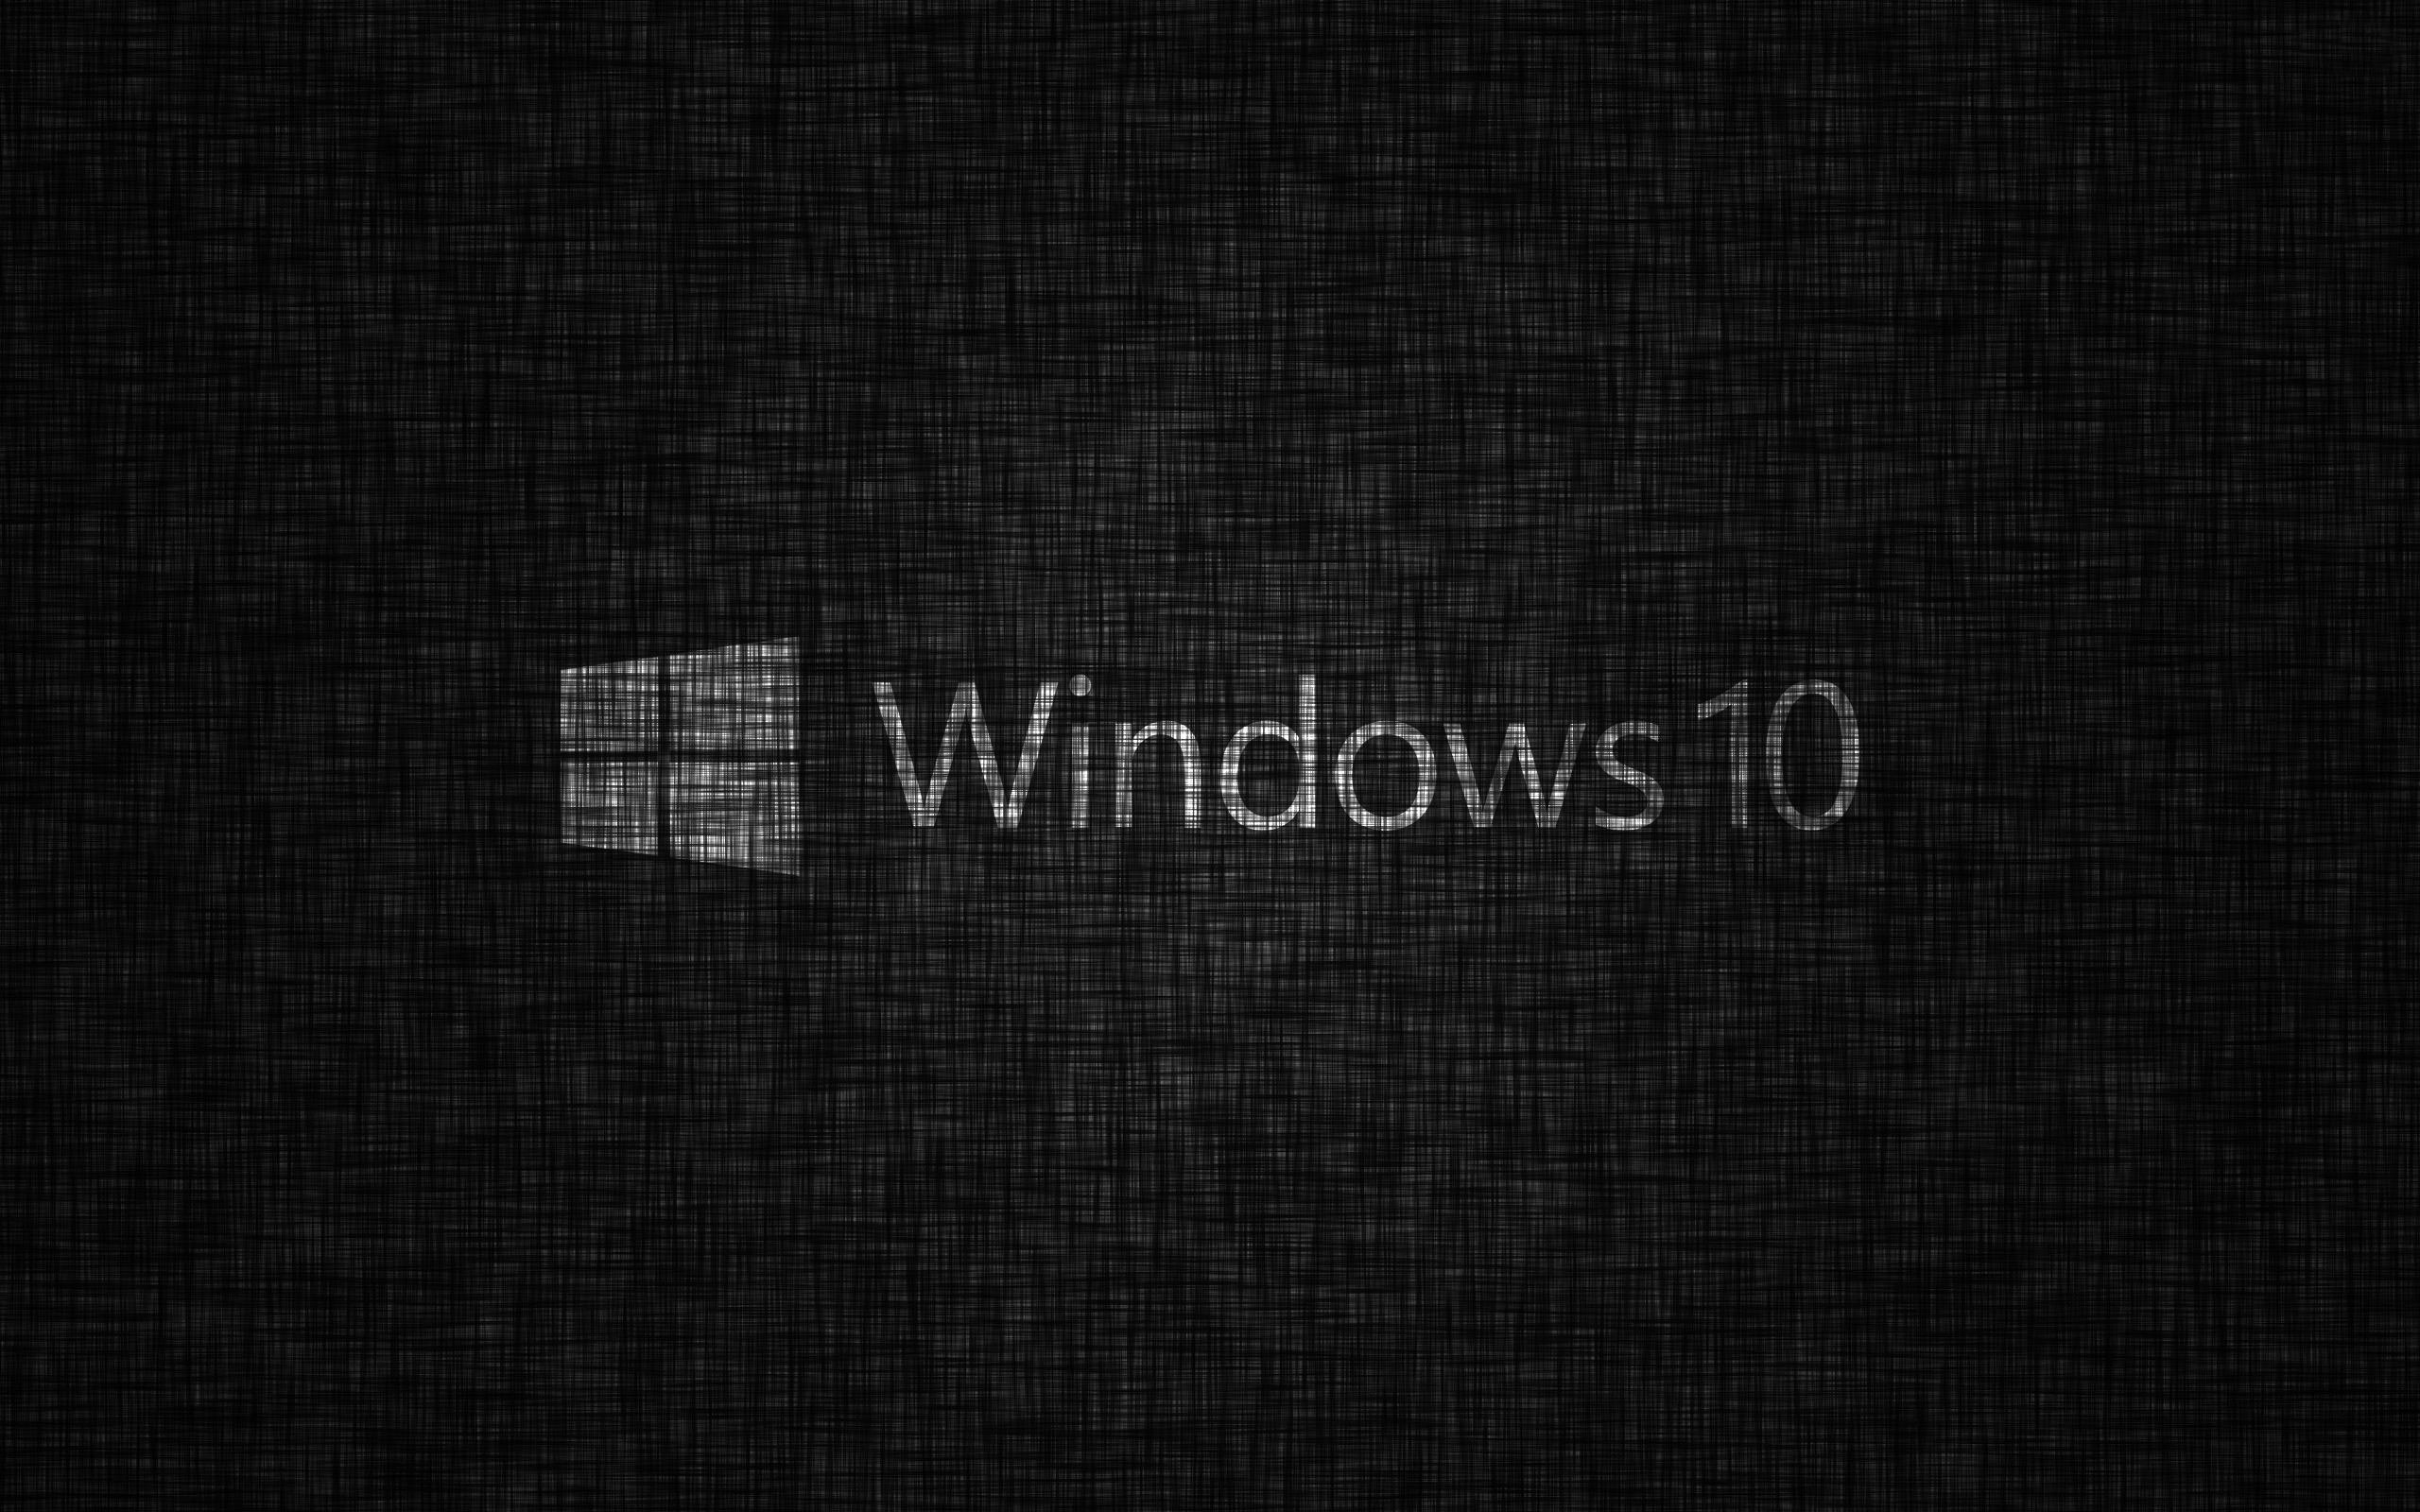 Windows 10 Hd Theme Desktop Wallpaper 08 Avance